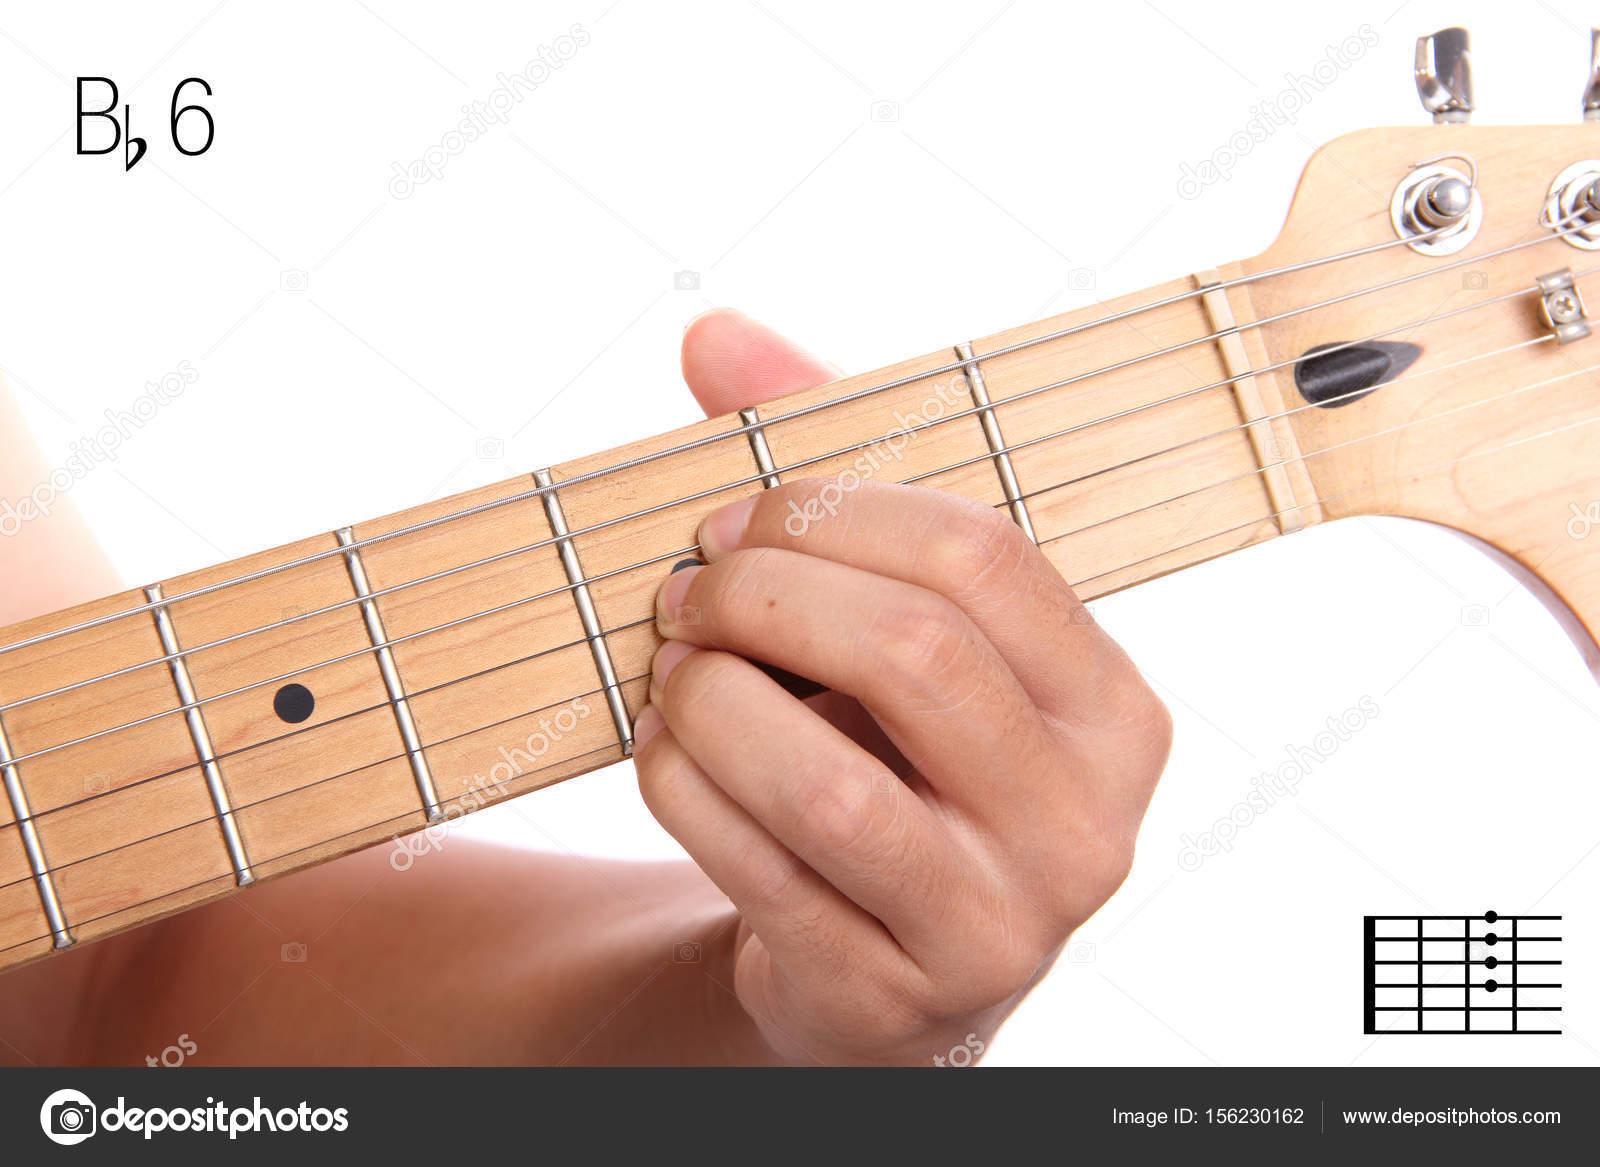 Bb6 Guitar Chord Tutorial Stock Photo Pepscostudio 156230162